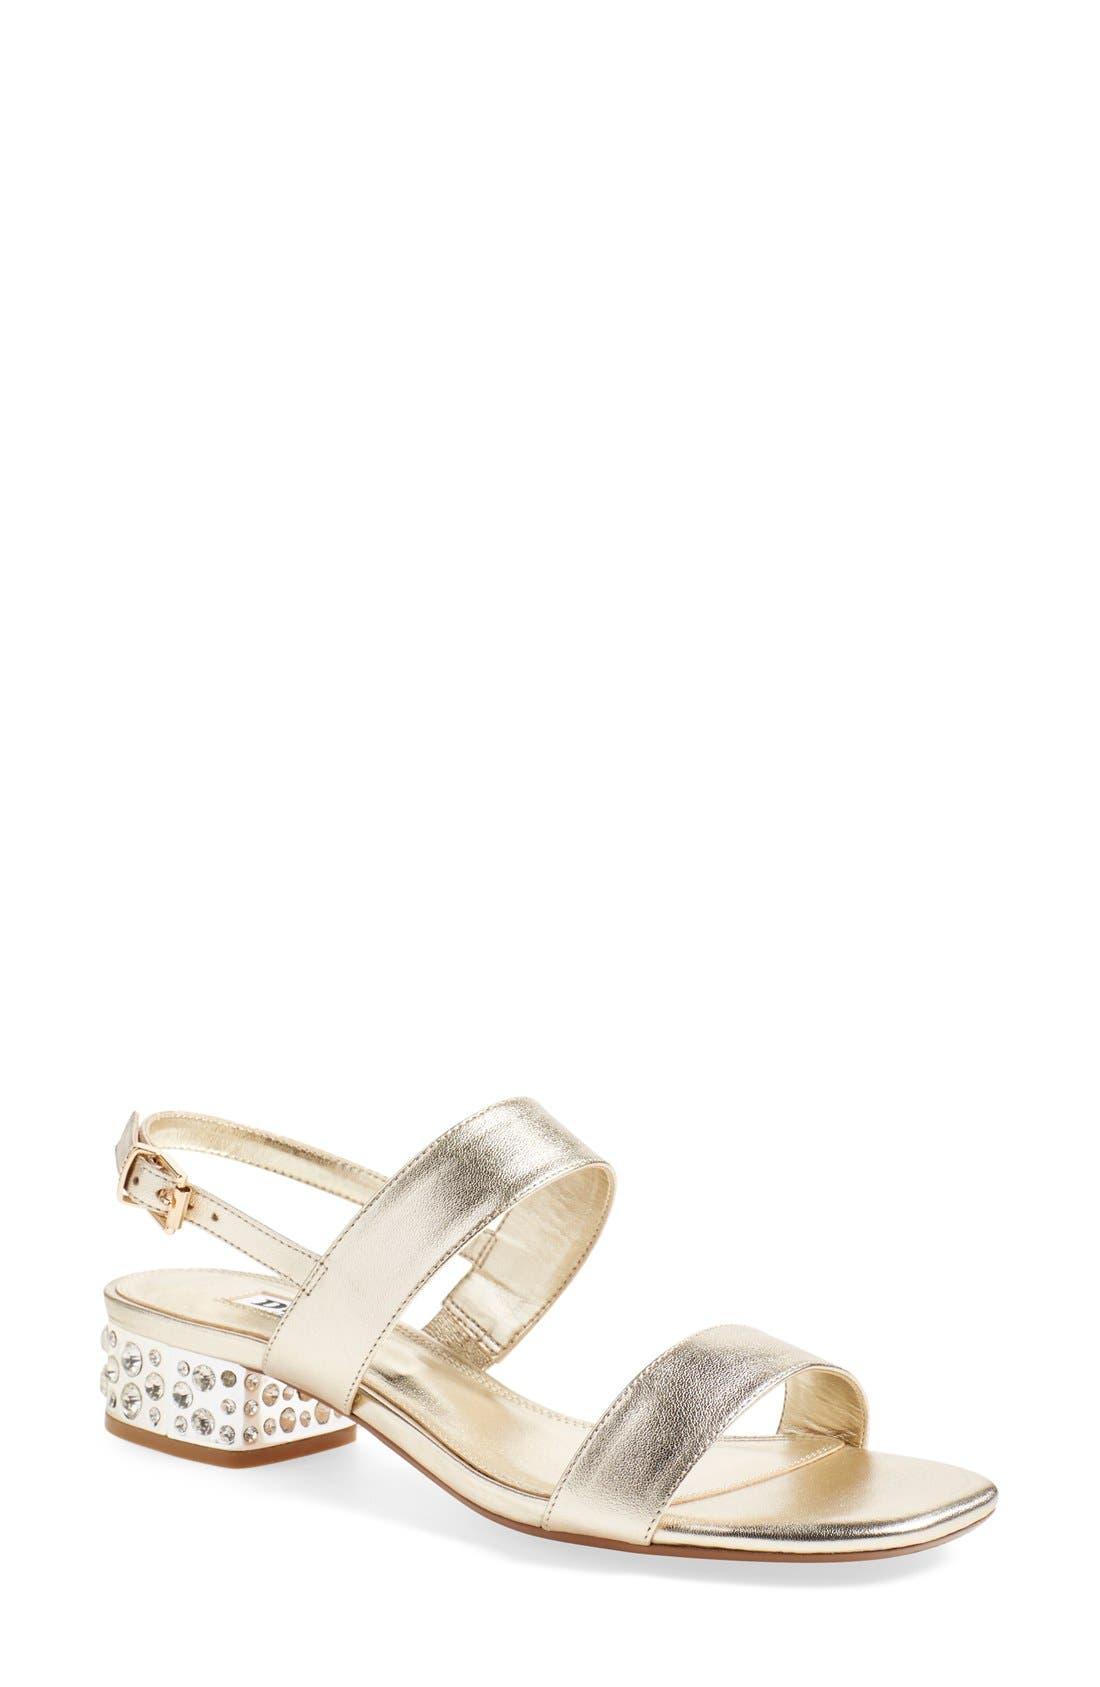 Alternate Image 1 Selected - Dune London 'Ninah' Embellished Block Heel Sandal (Women)